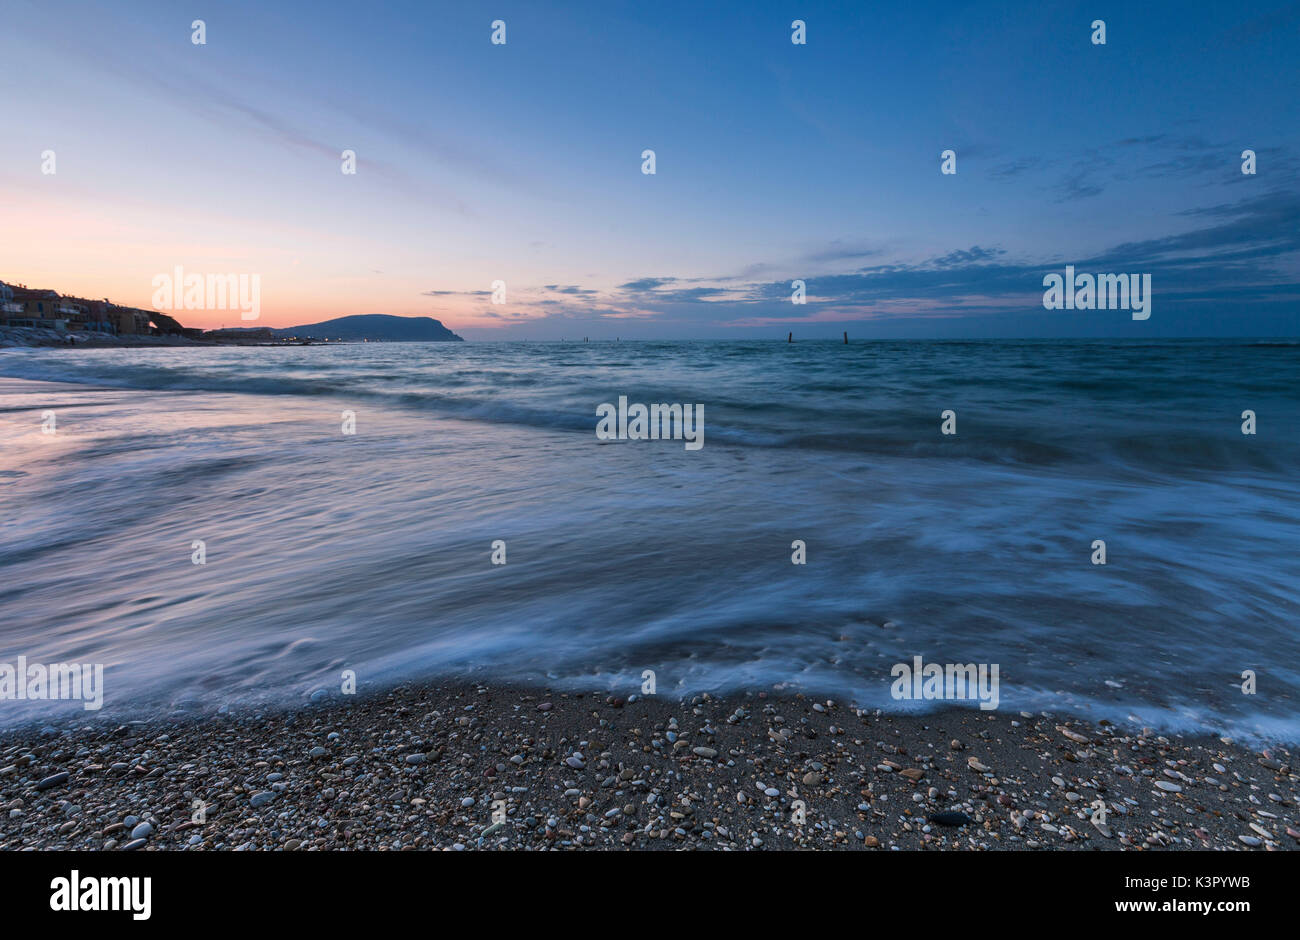 Waves crashing on the beach framed by the blue dusk Porto Recanati